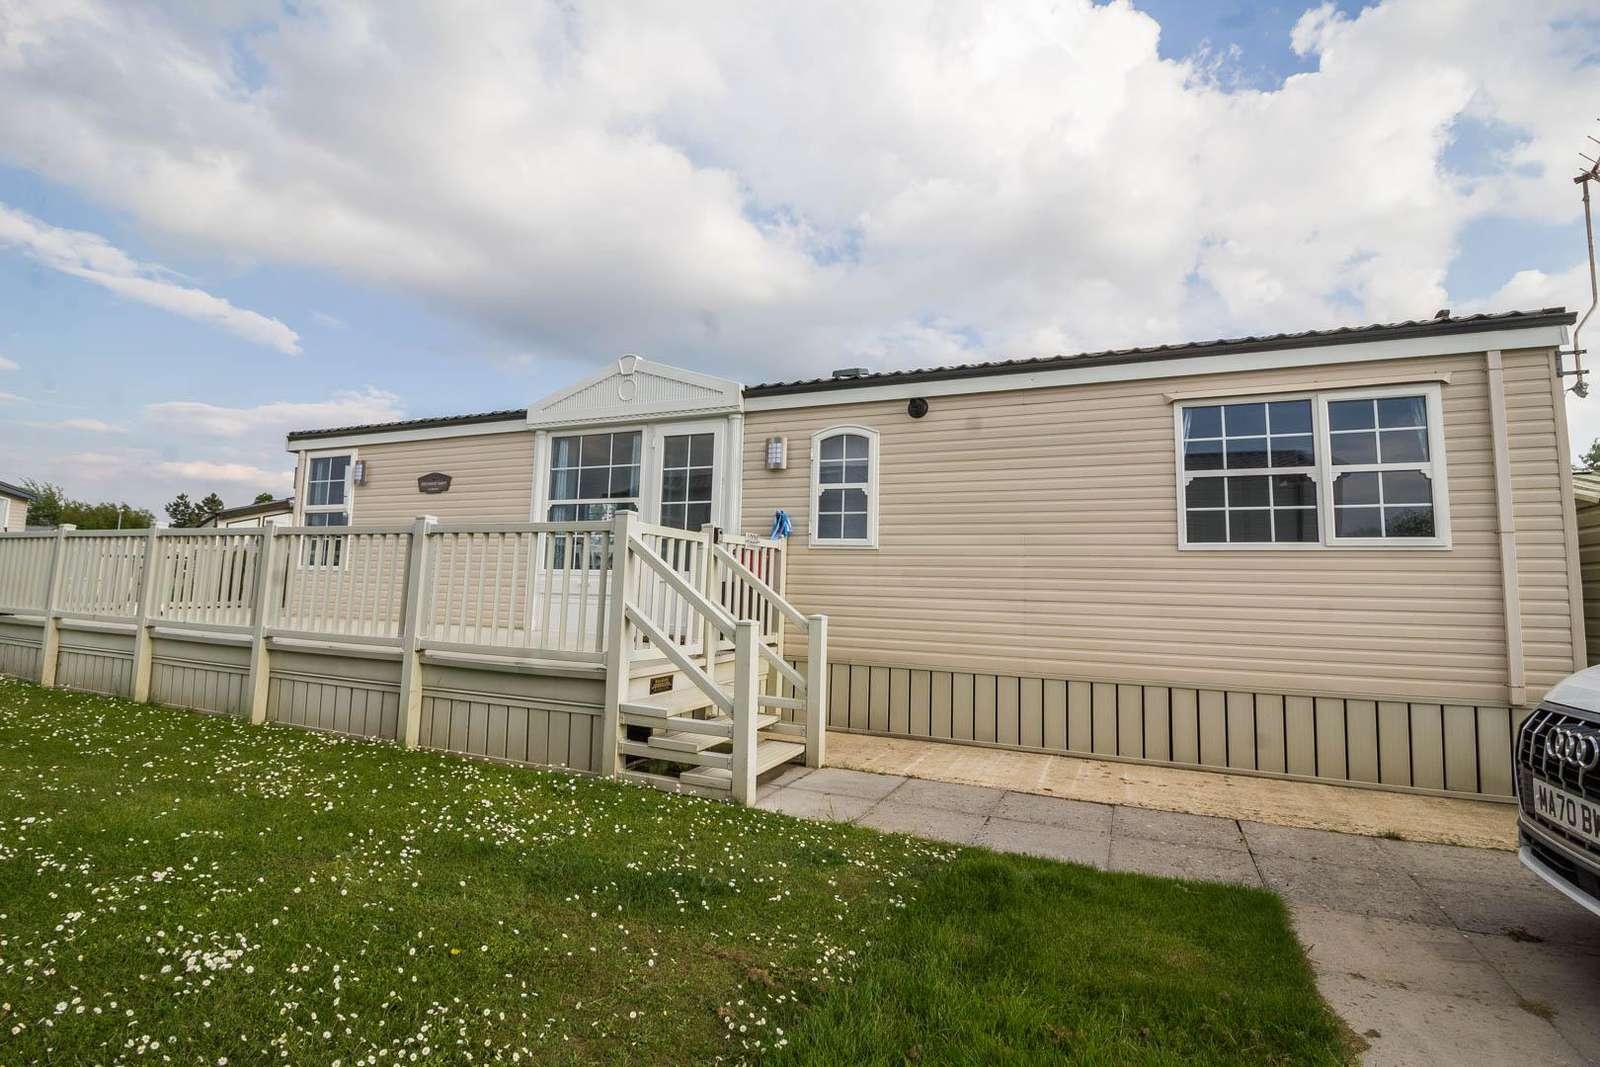 23225K – Kensington area, 2 bed, 6 berth caravan with decking. Diamond-Plus rated. - property